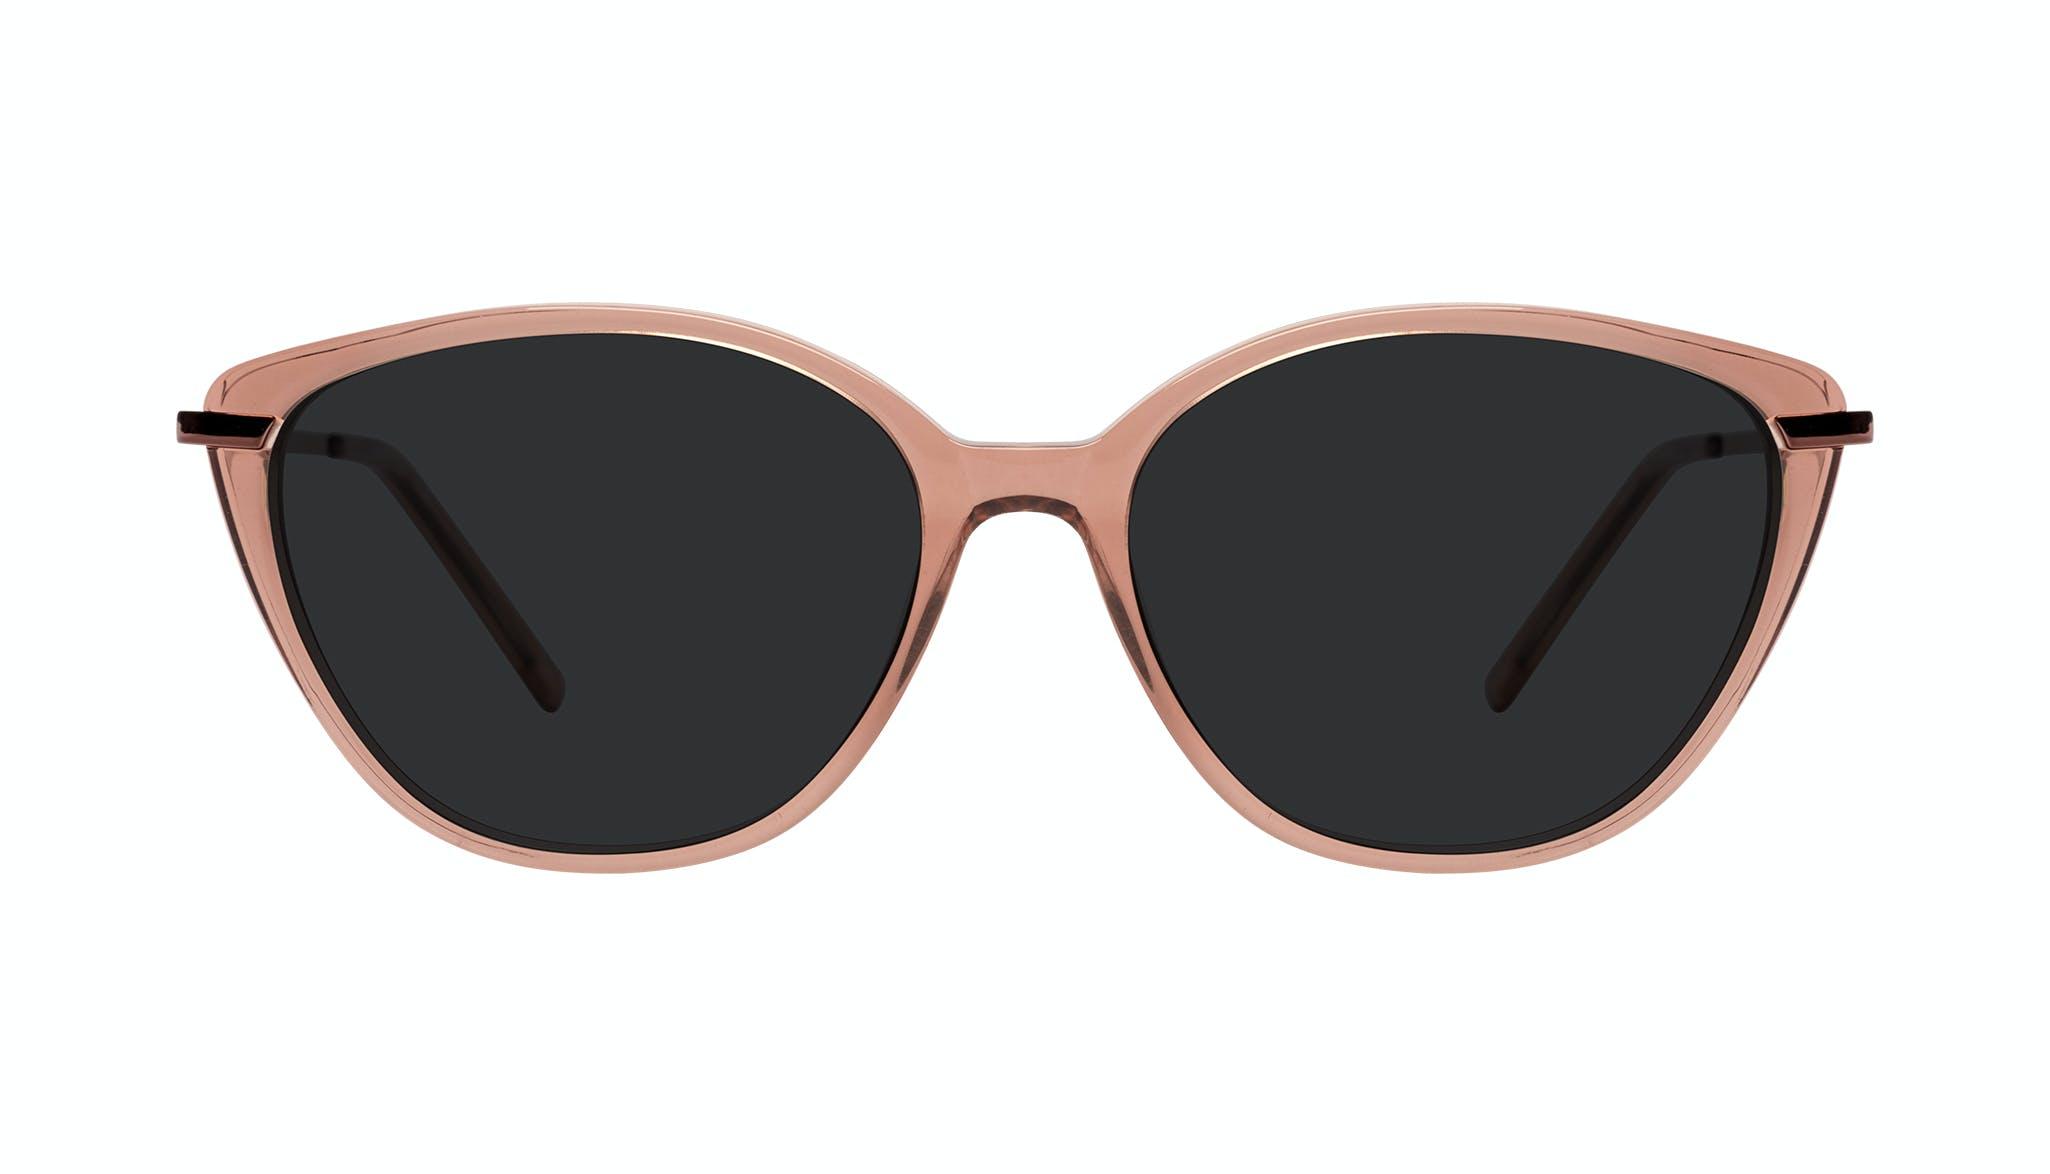 Affordable Fashion Glasses Cat Eye Sunglasses Women Illusion Plus Rose